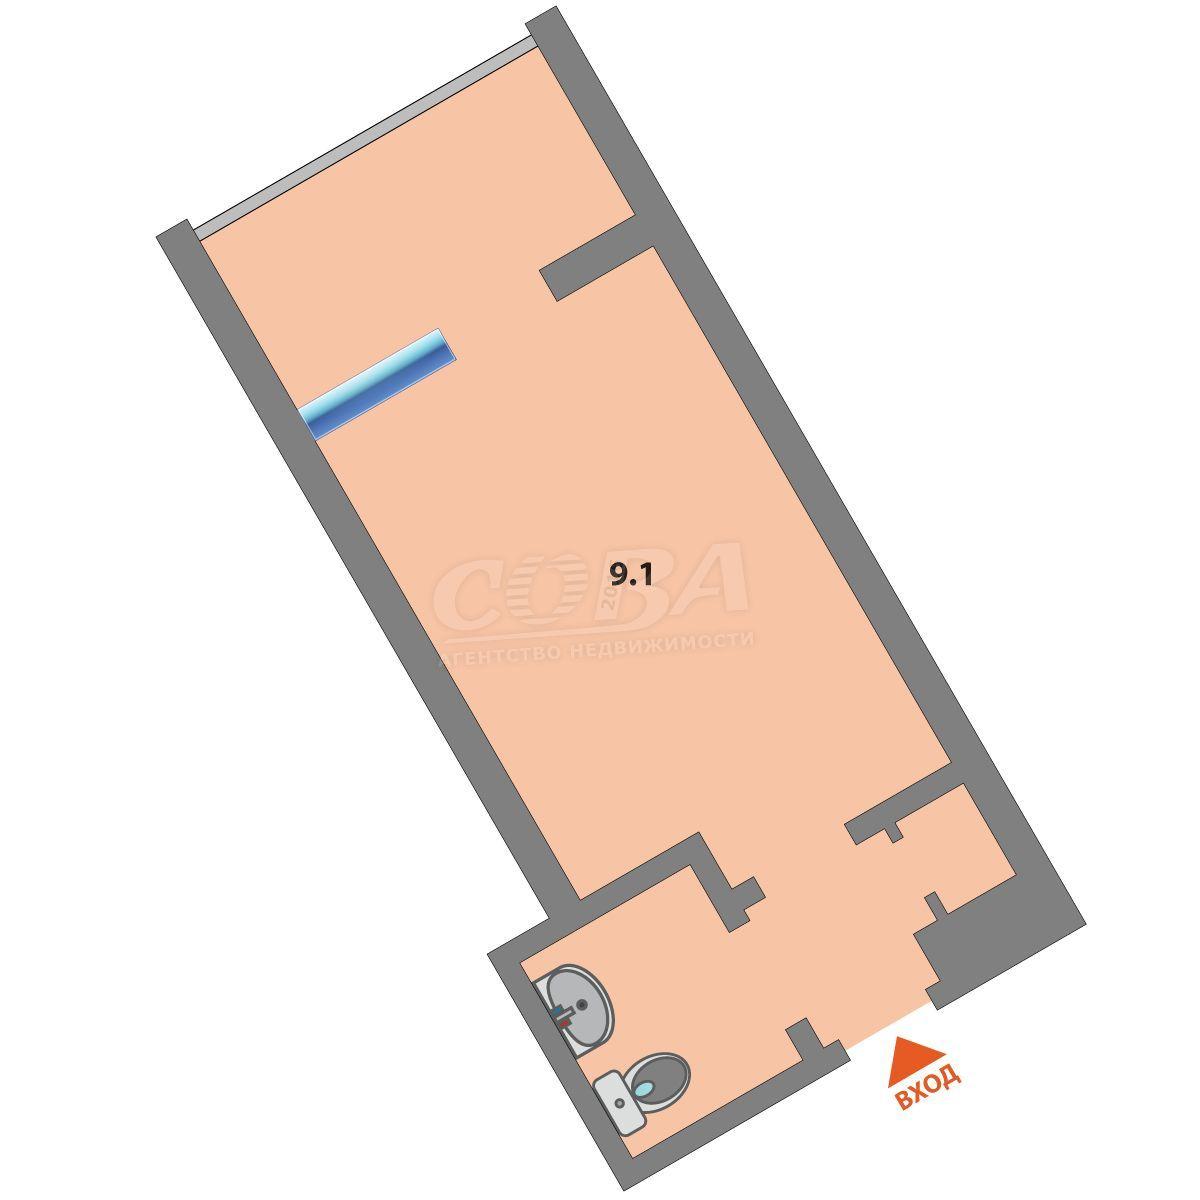 Пансионат в 1 микрорайоне, ул. Олимпийская, 12А, г. Тюмень